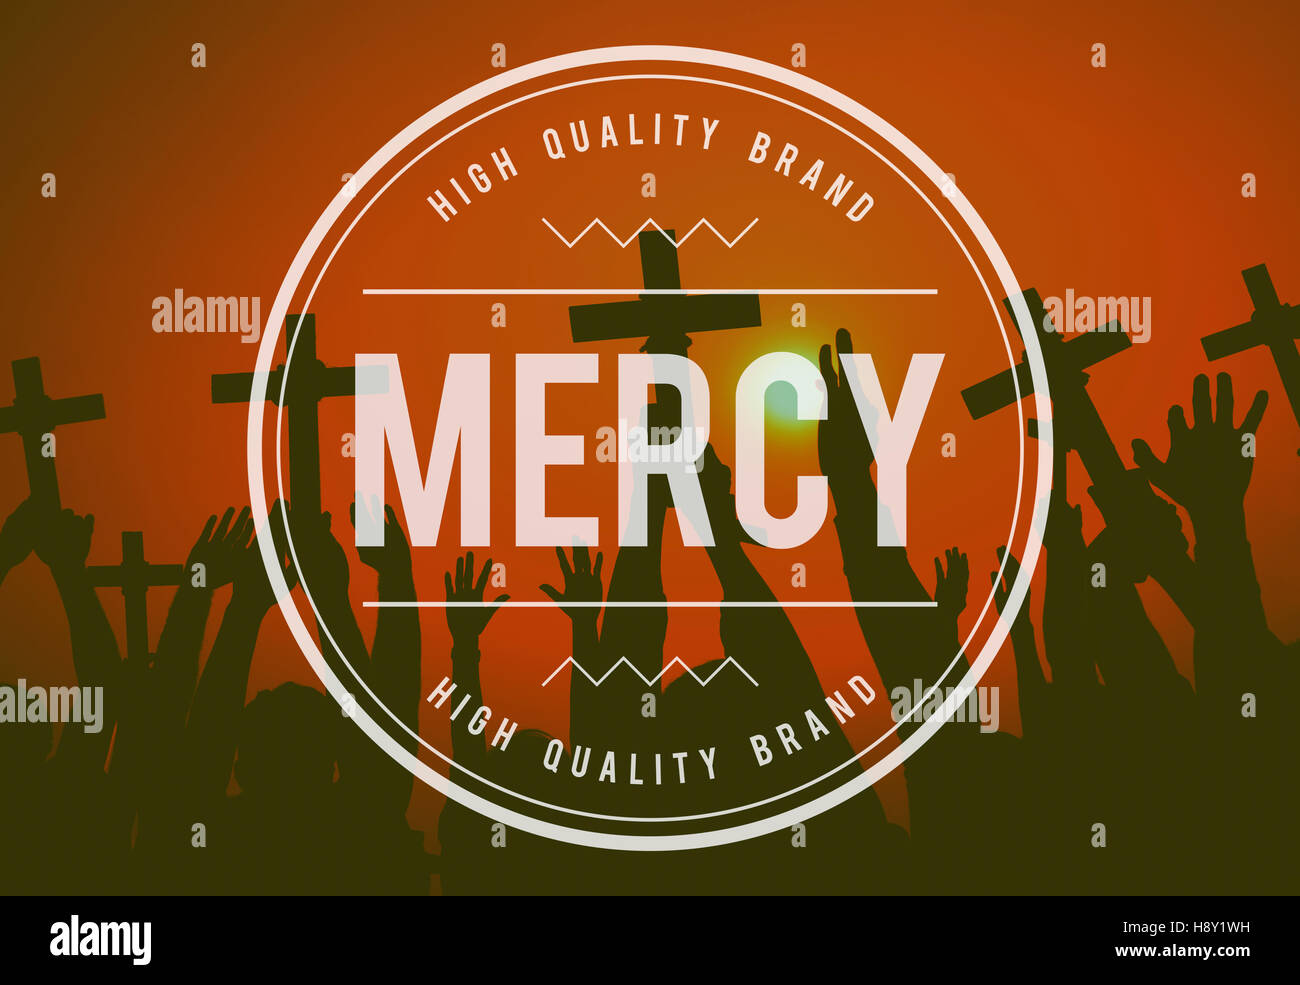 Mercy Forgiveness Religion Hope Christianity Concept - Stock Image